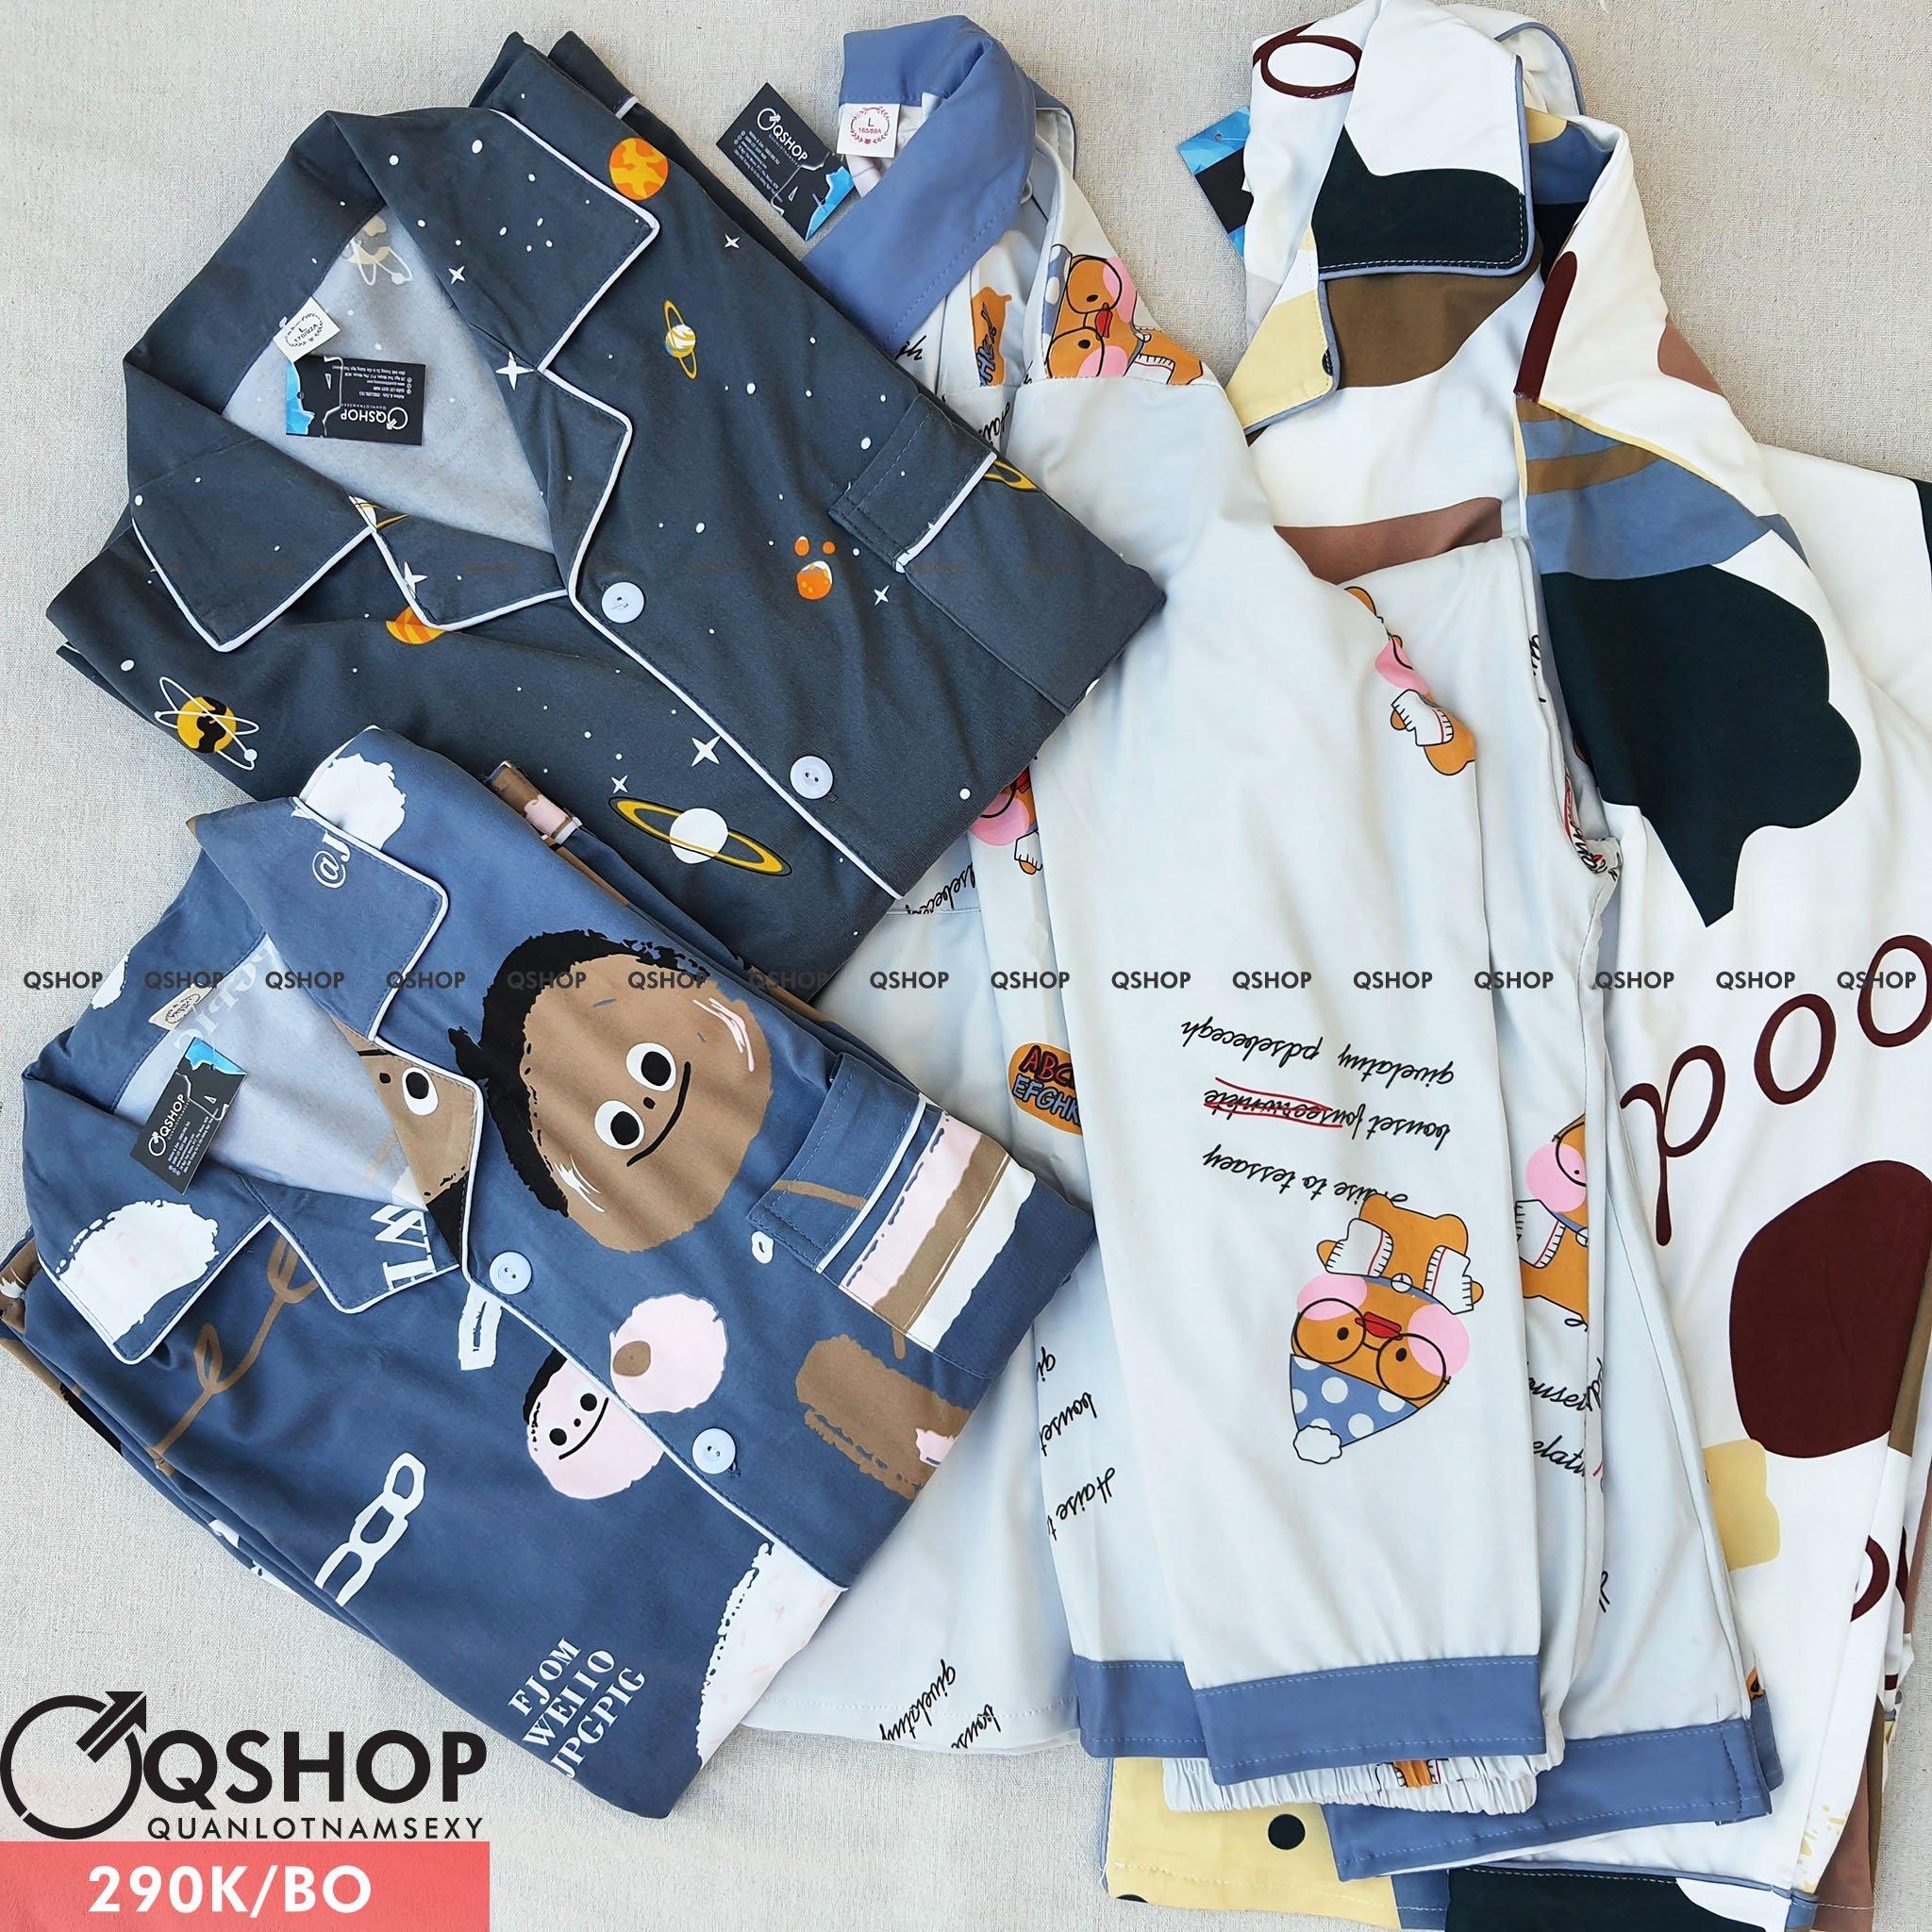 Bộ pijama nam thun cotton mềm mịn QM260